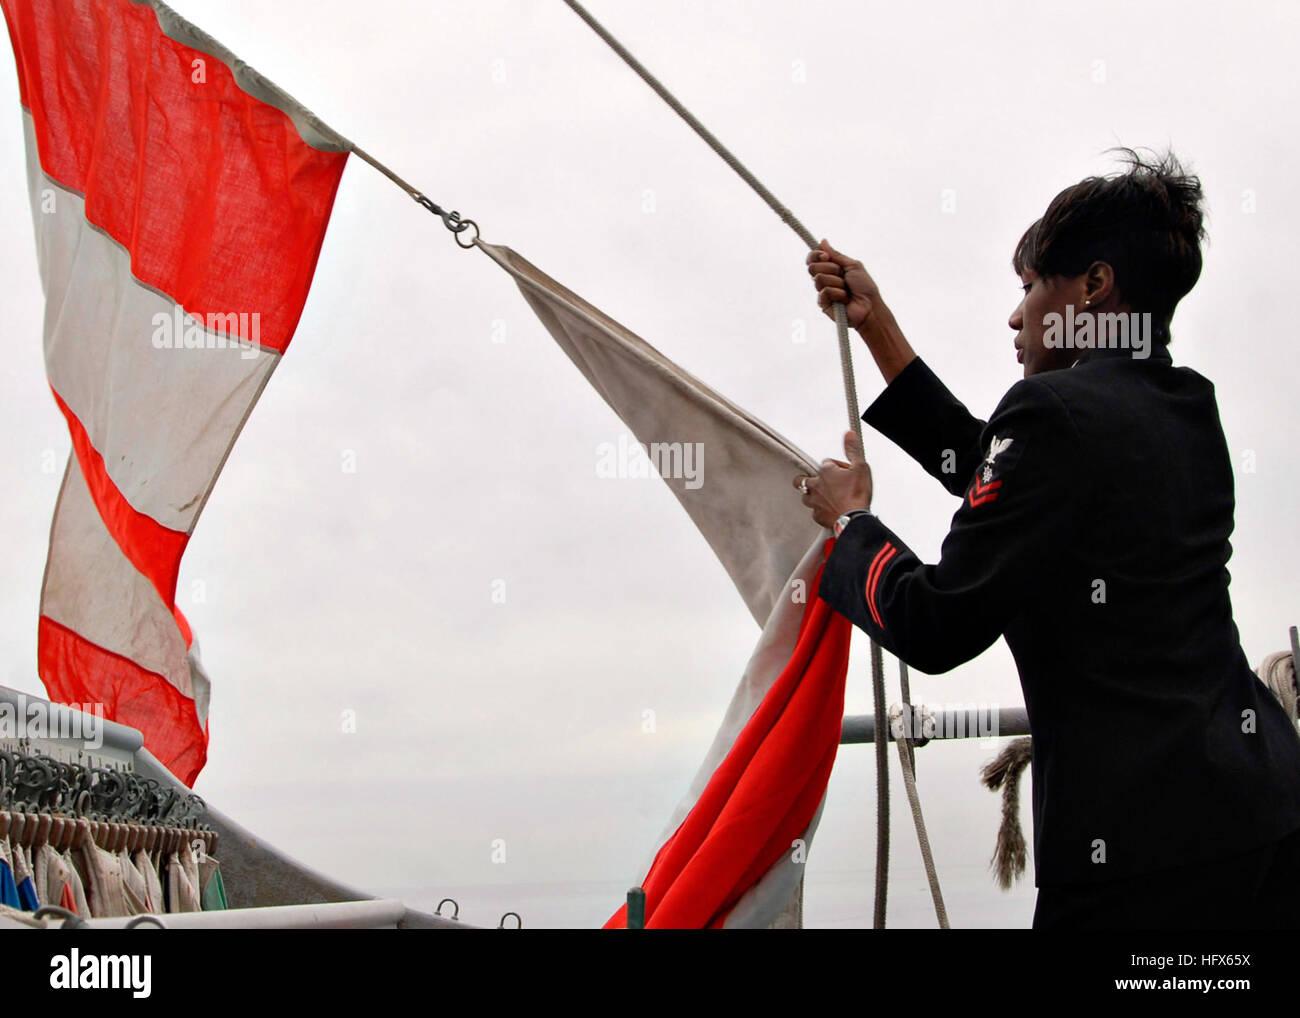 090302-N-3392P-099 ANTALYA, Turkey (March 2, 2009) Quartermaster 2nd Class Angela Everett hoists a ÒCode HotelÓ - Stock Image